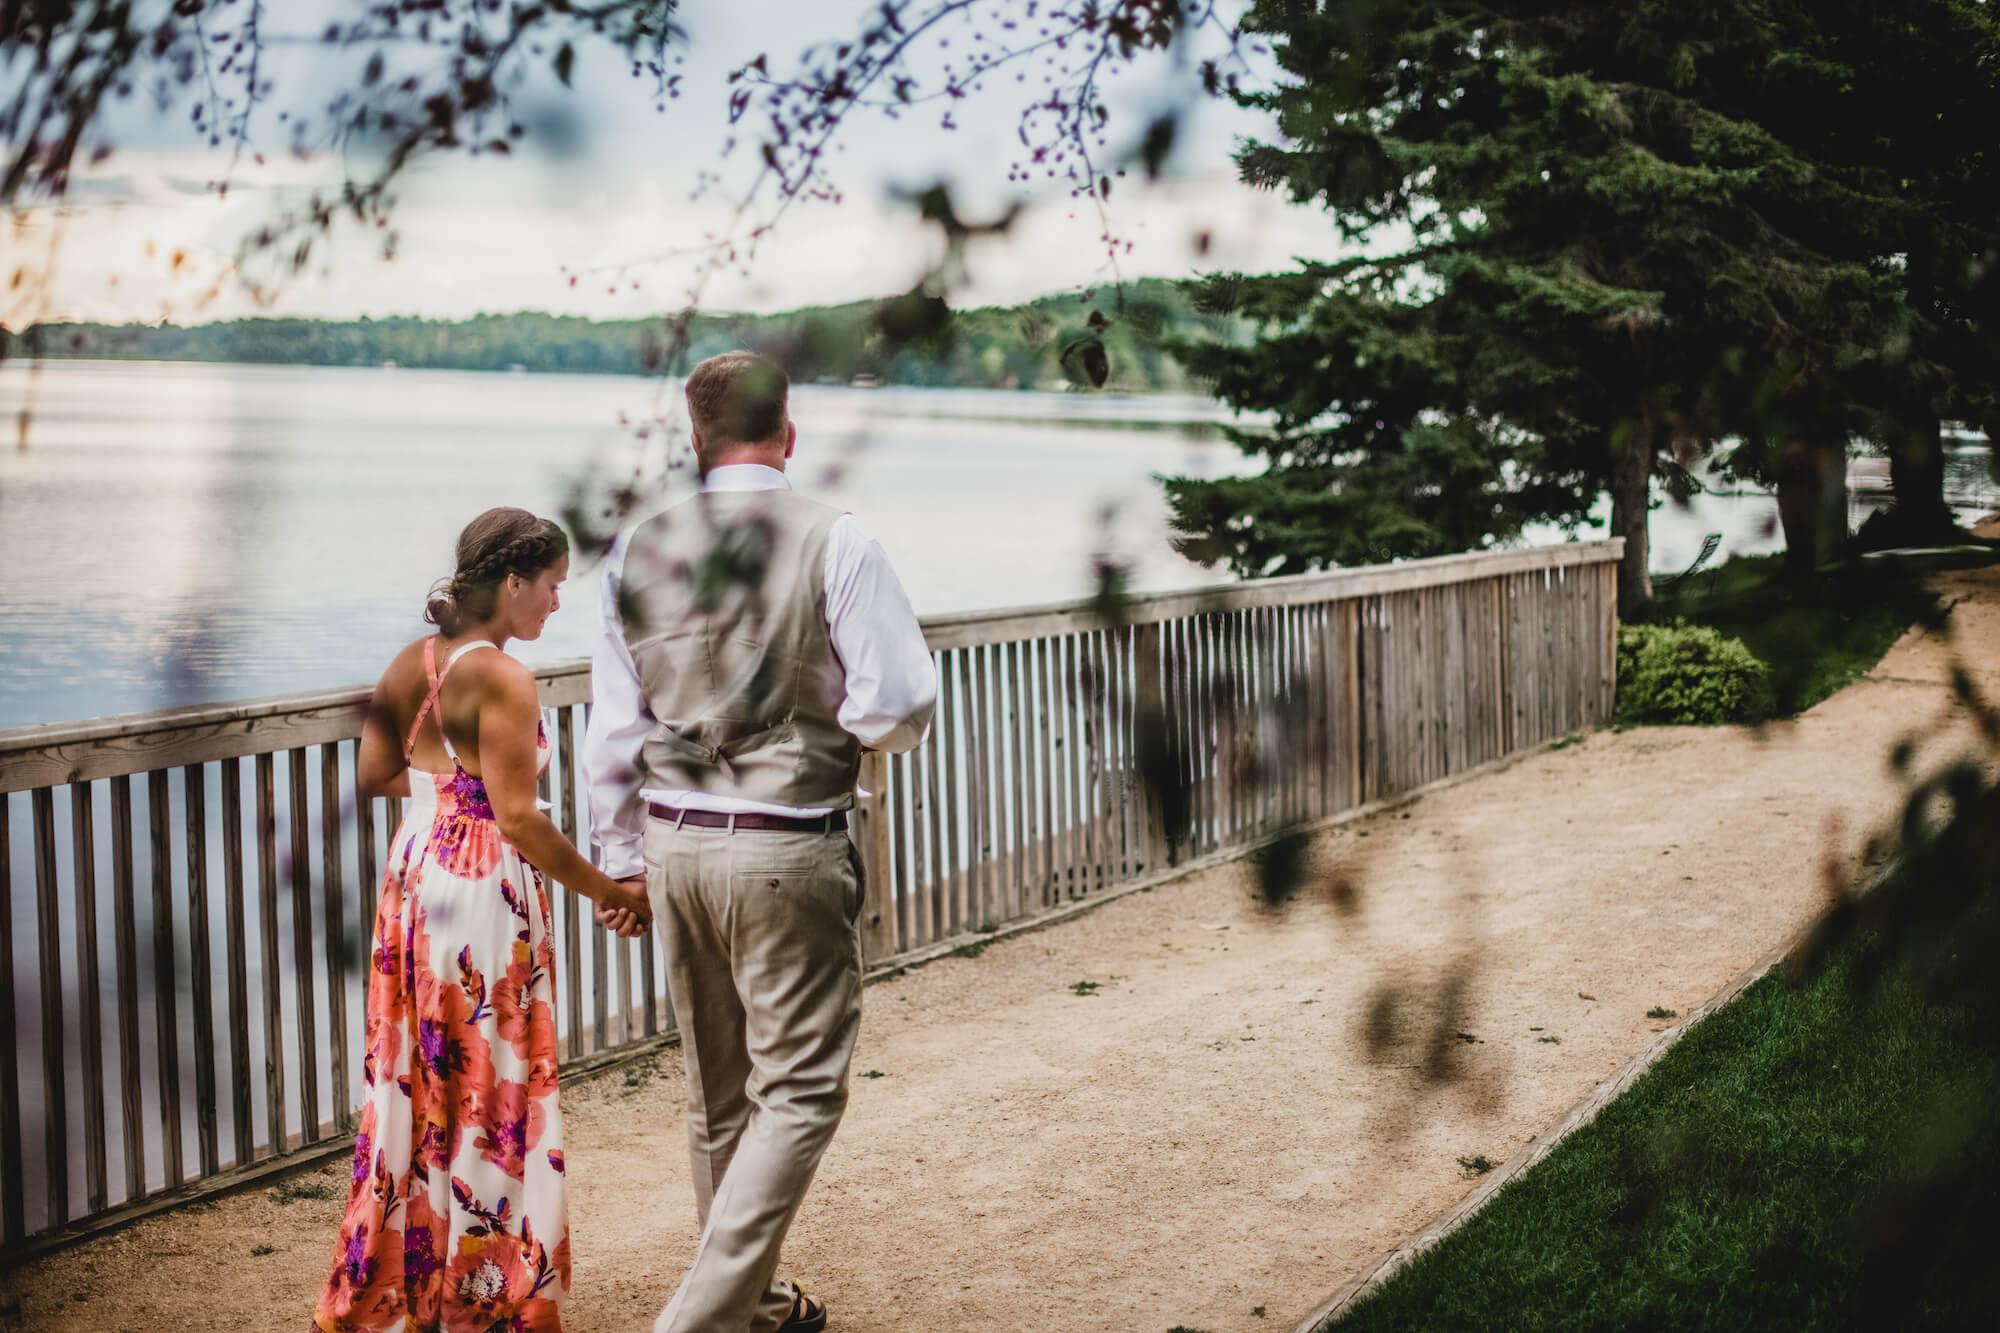 engle-olson-maddy-pat-mn-wedding-photography-49.jpg